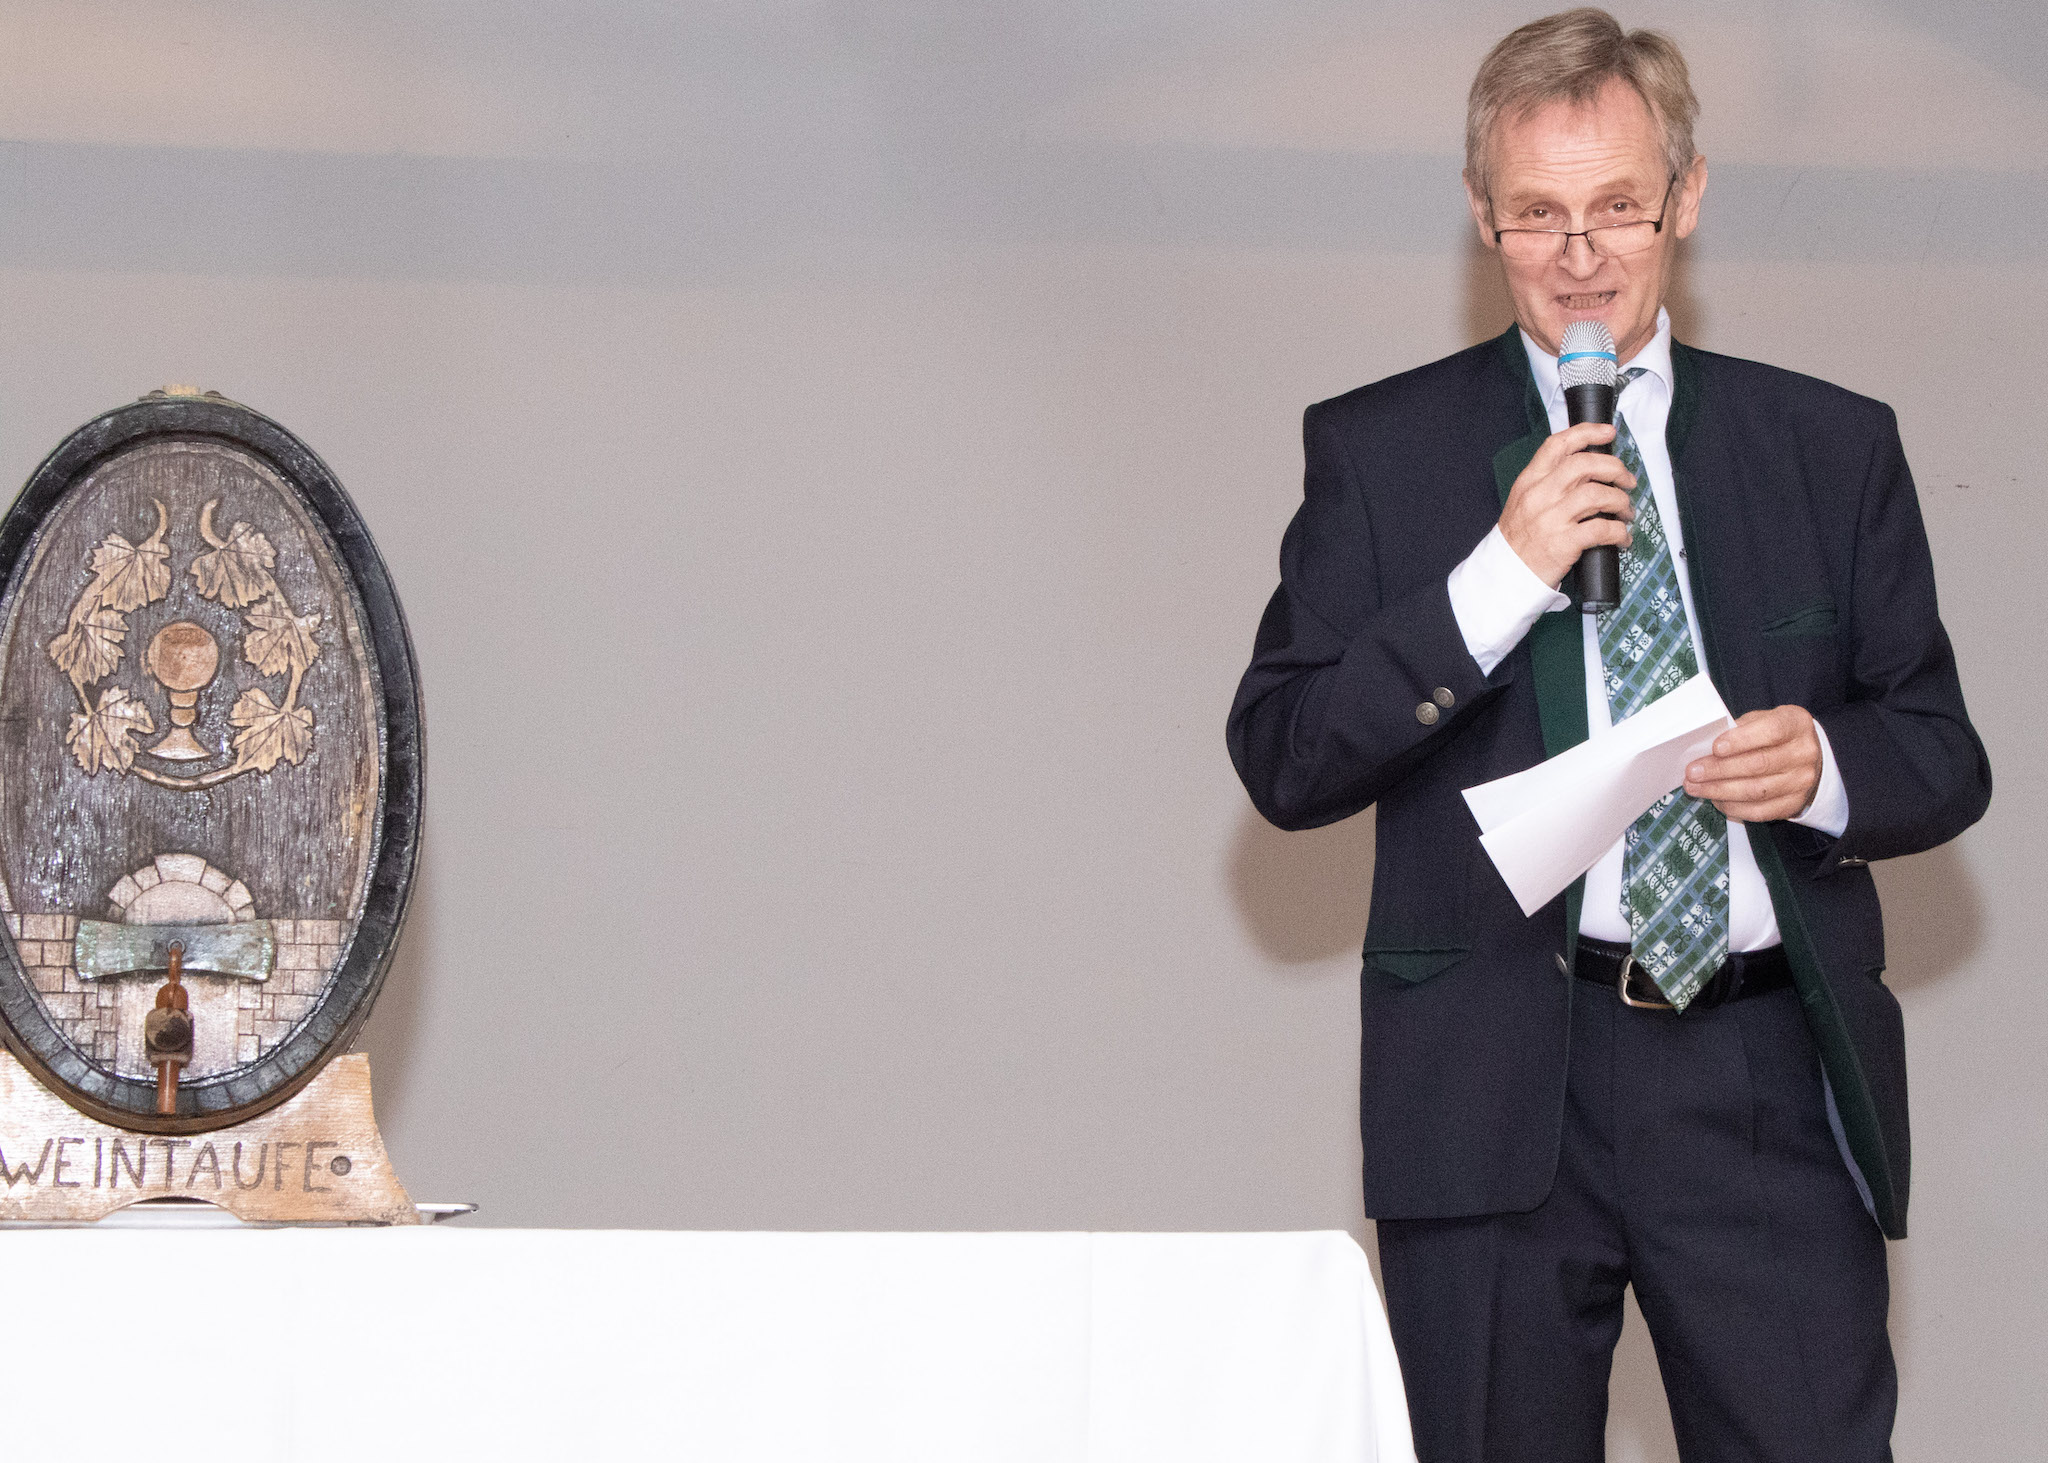 Weintaufe 2019 Vizebuergermeister Winzerhof Weiss